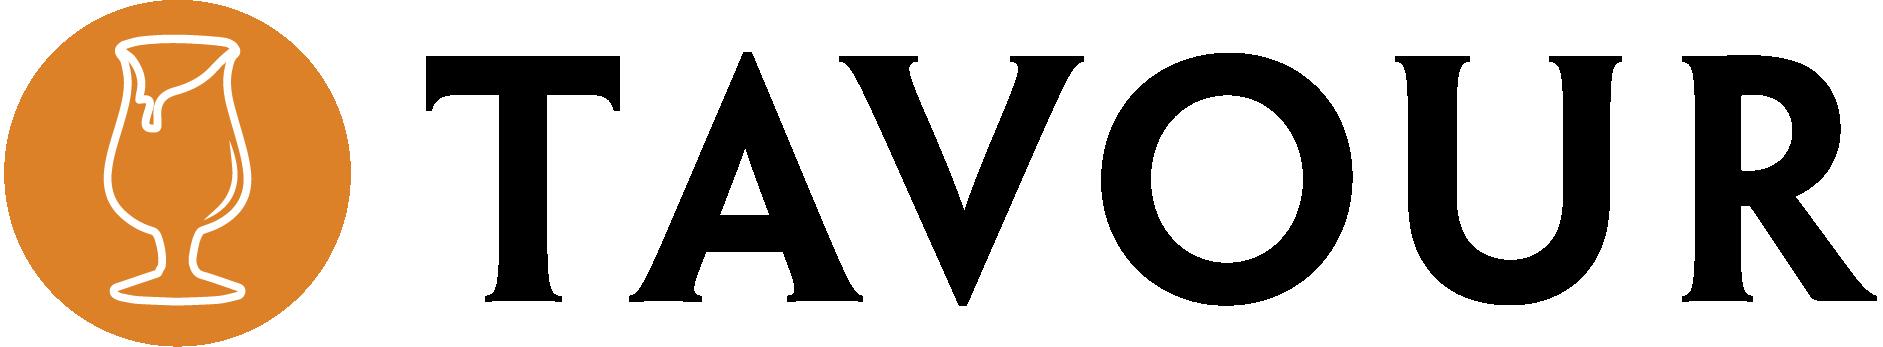 tavour-transparent-lg